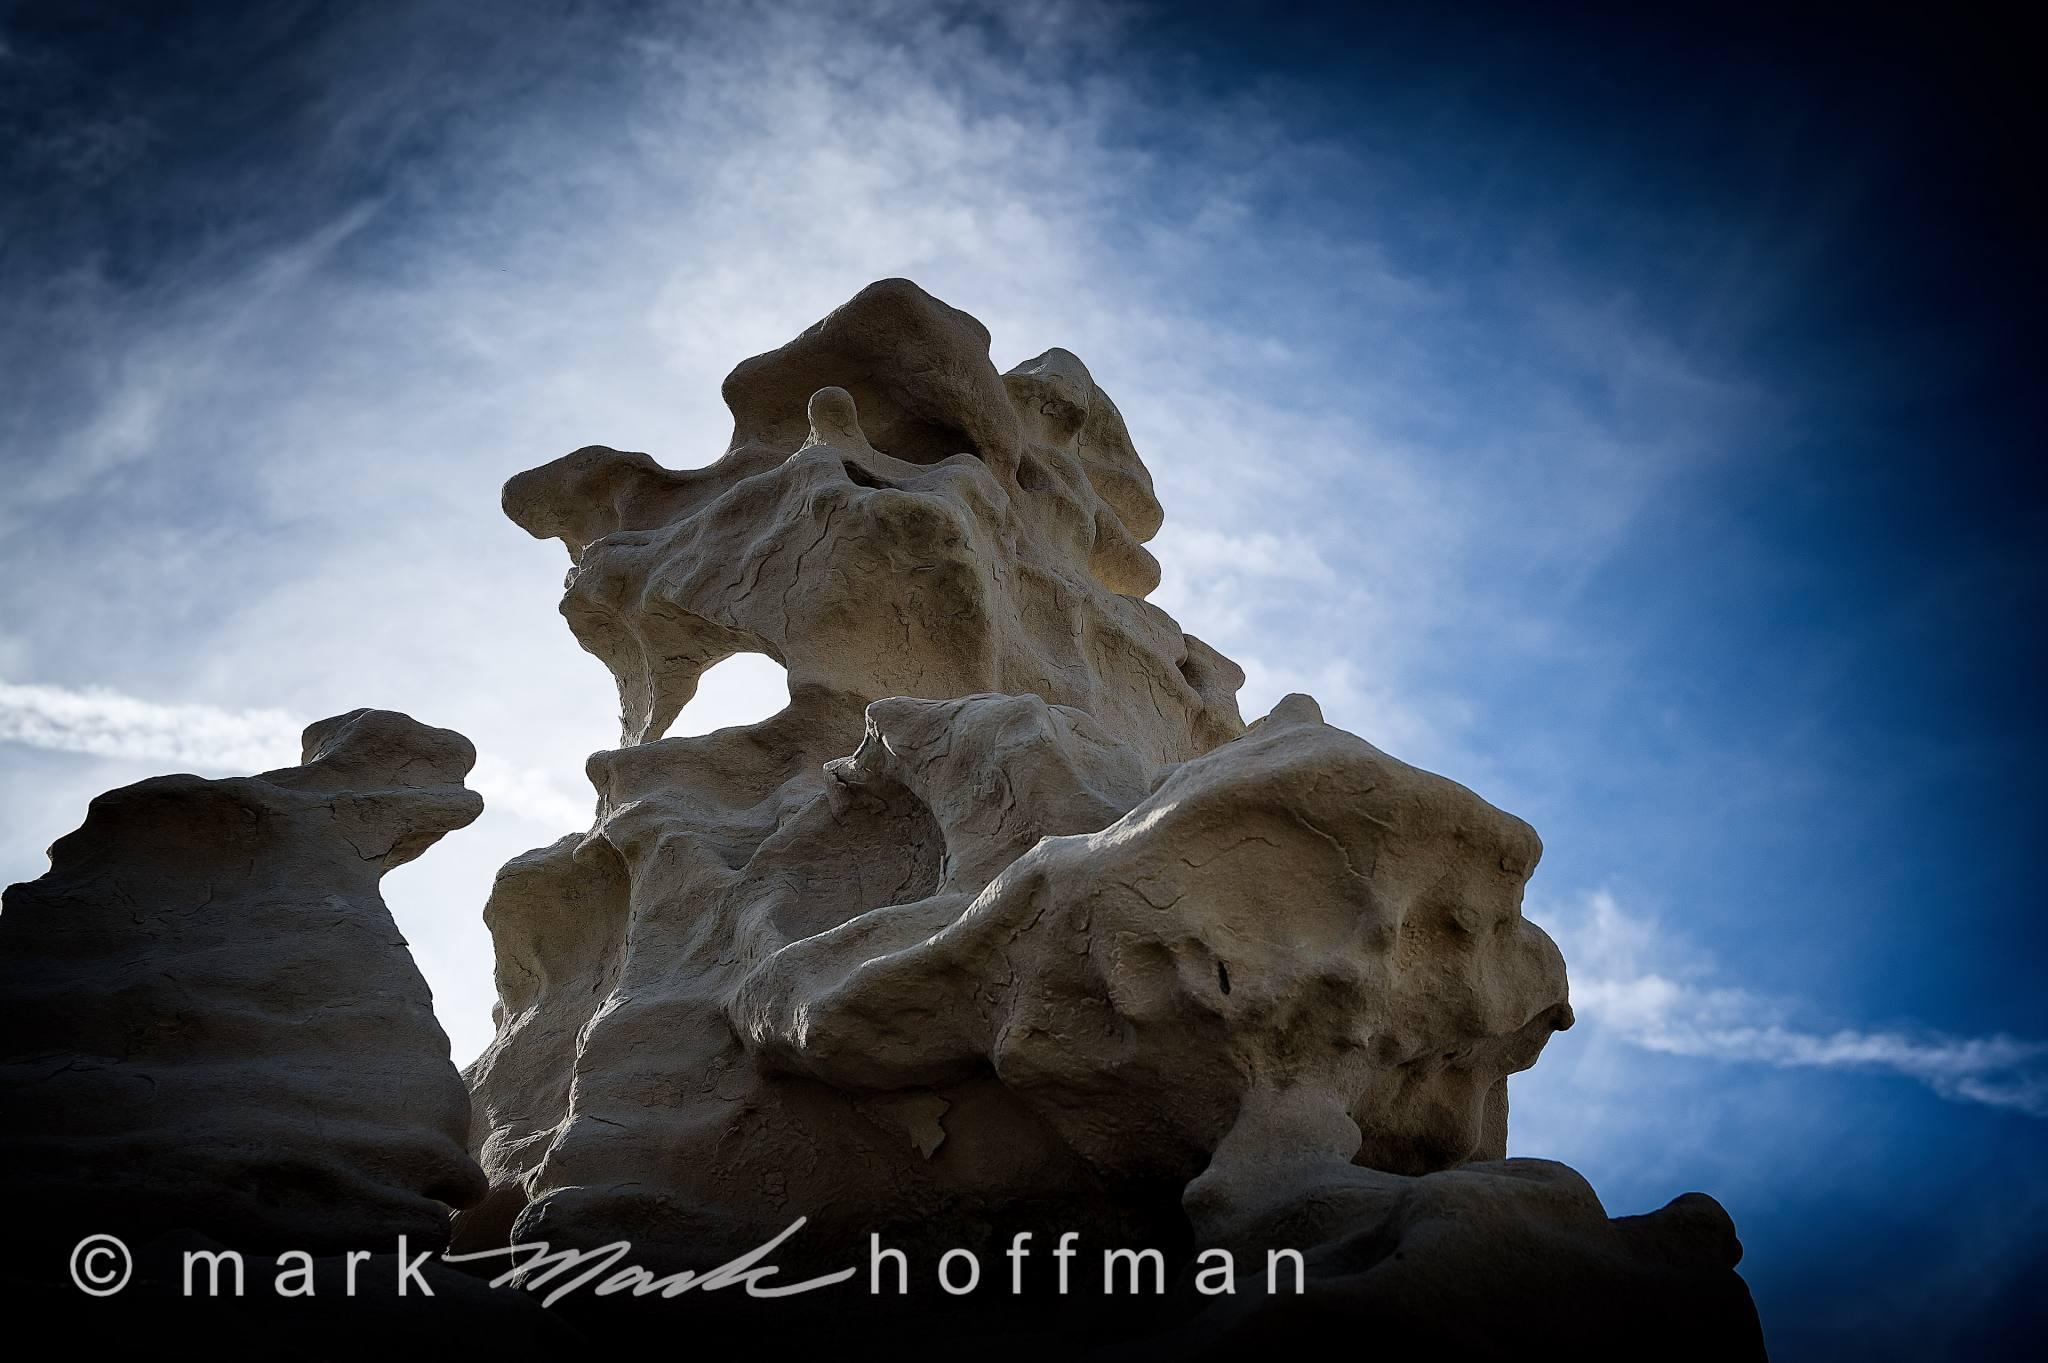 Mark_Hoffman_20141017_0110_PPORT_cap1_var1.jpg